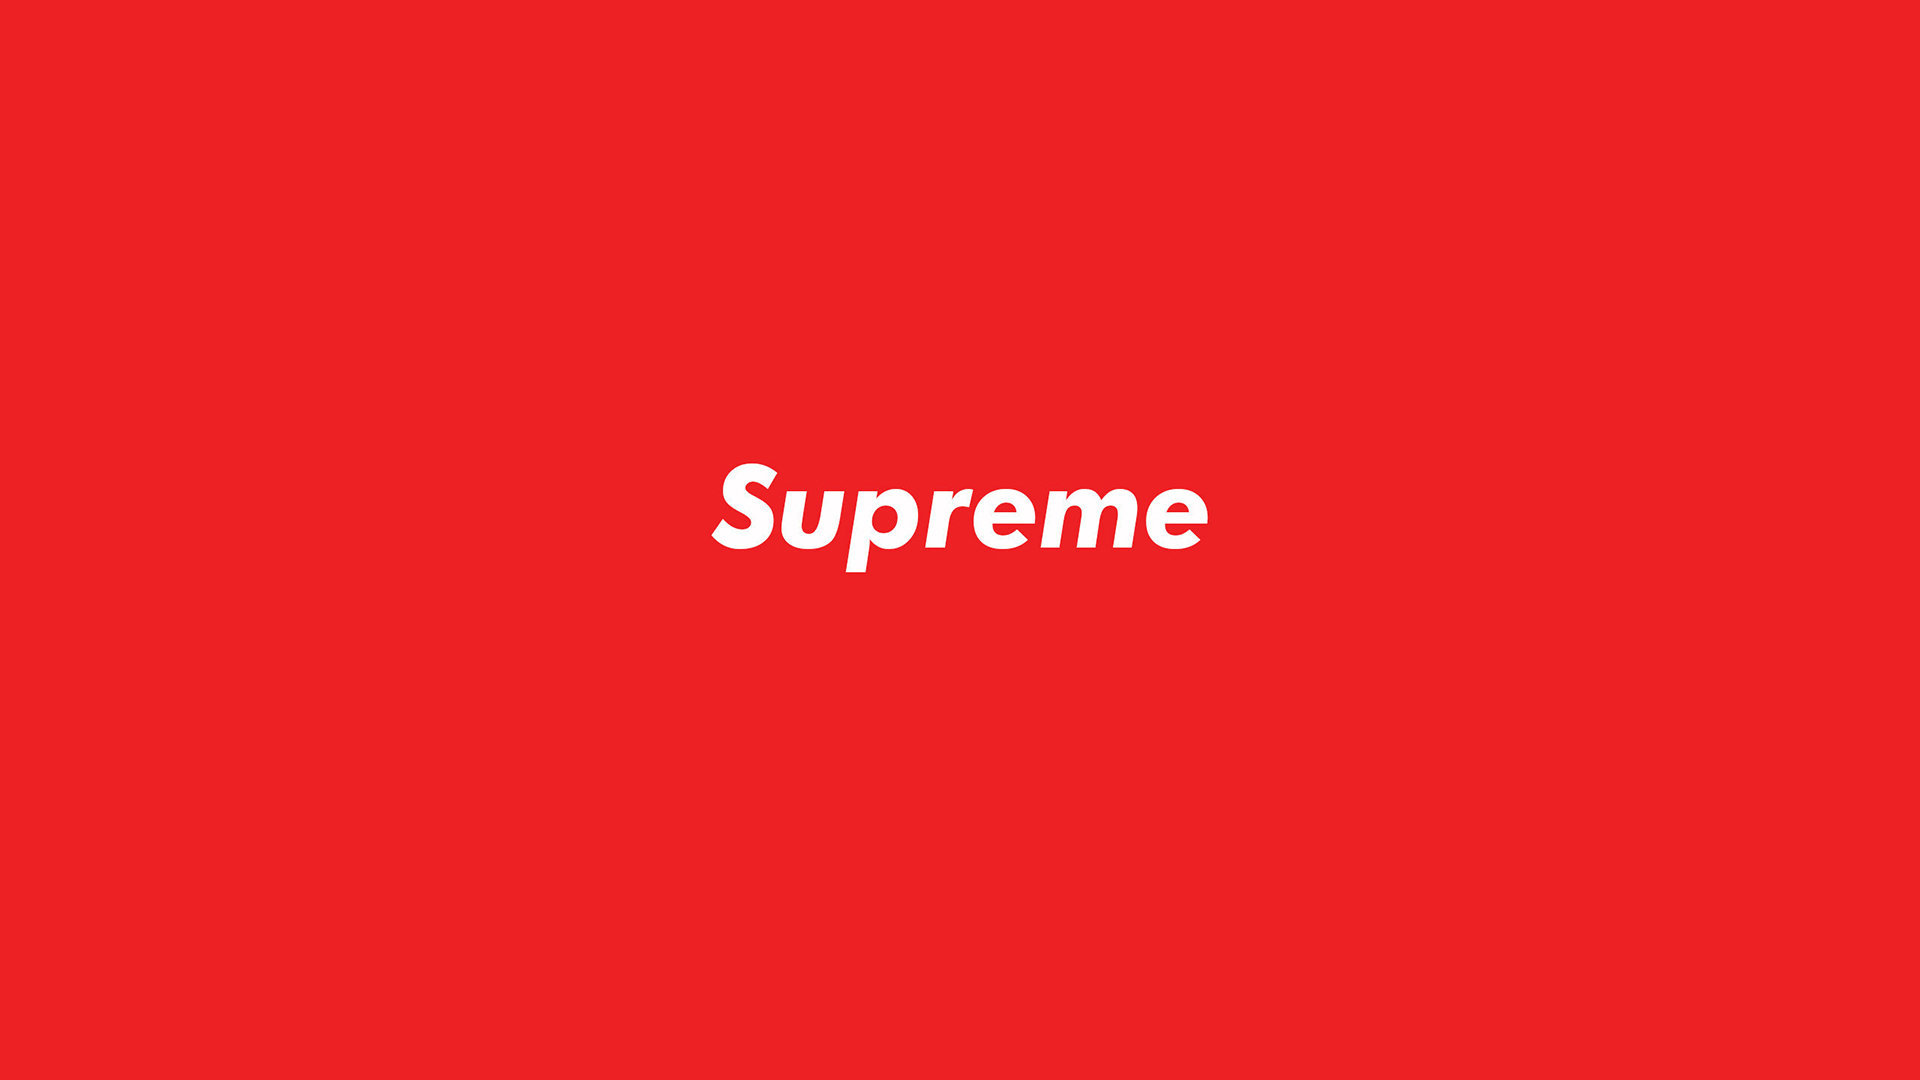 Supreme Clothing Logo No Background car vinyl sticker decal